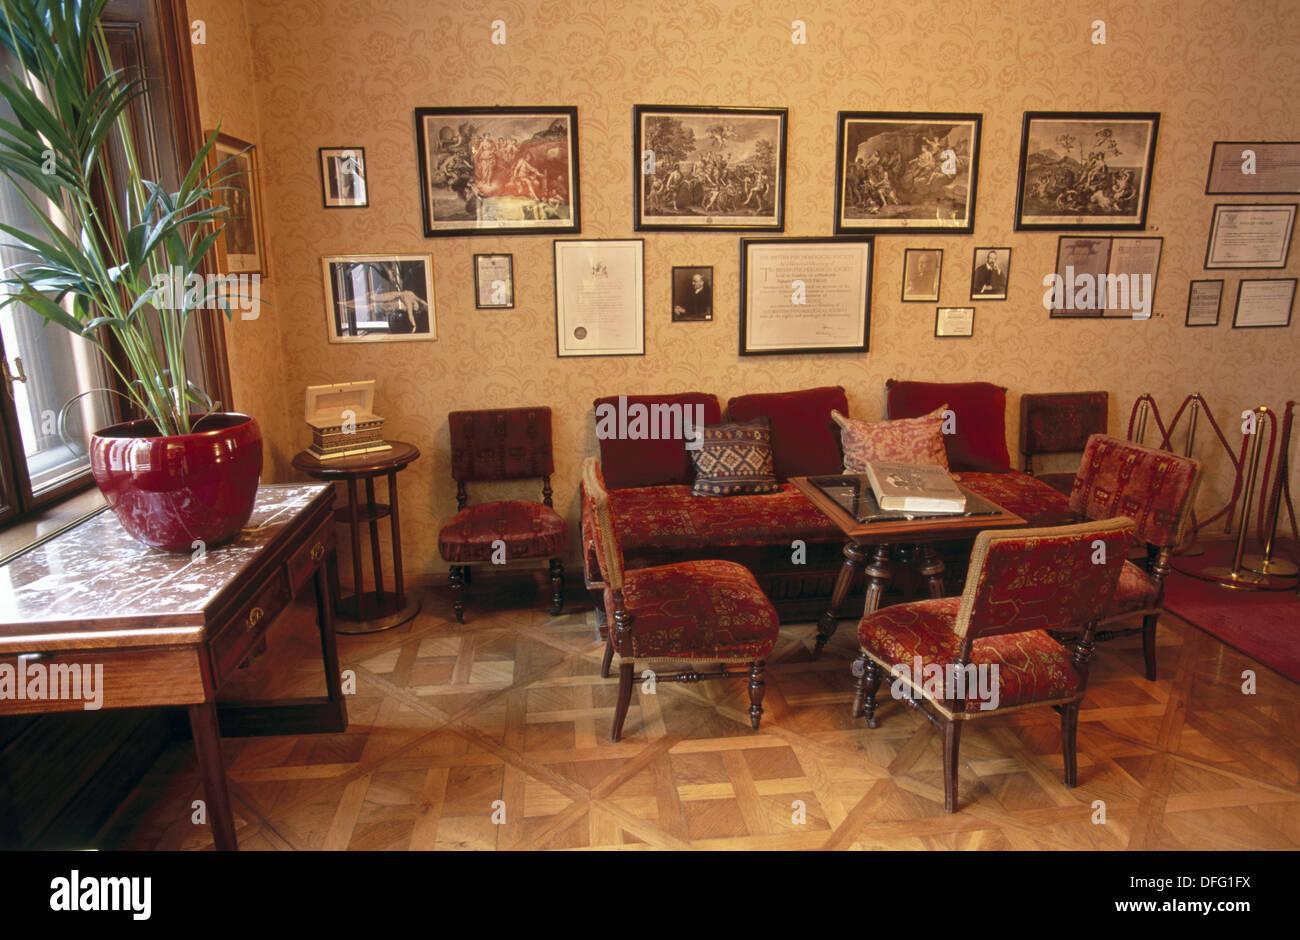 Waiting room. Sigmund Freud Museum. Vienna. Austria - Stock Image